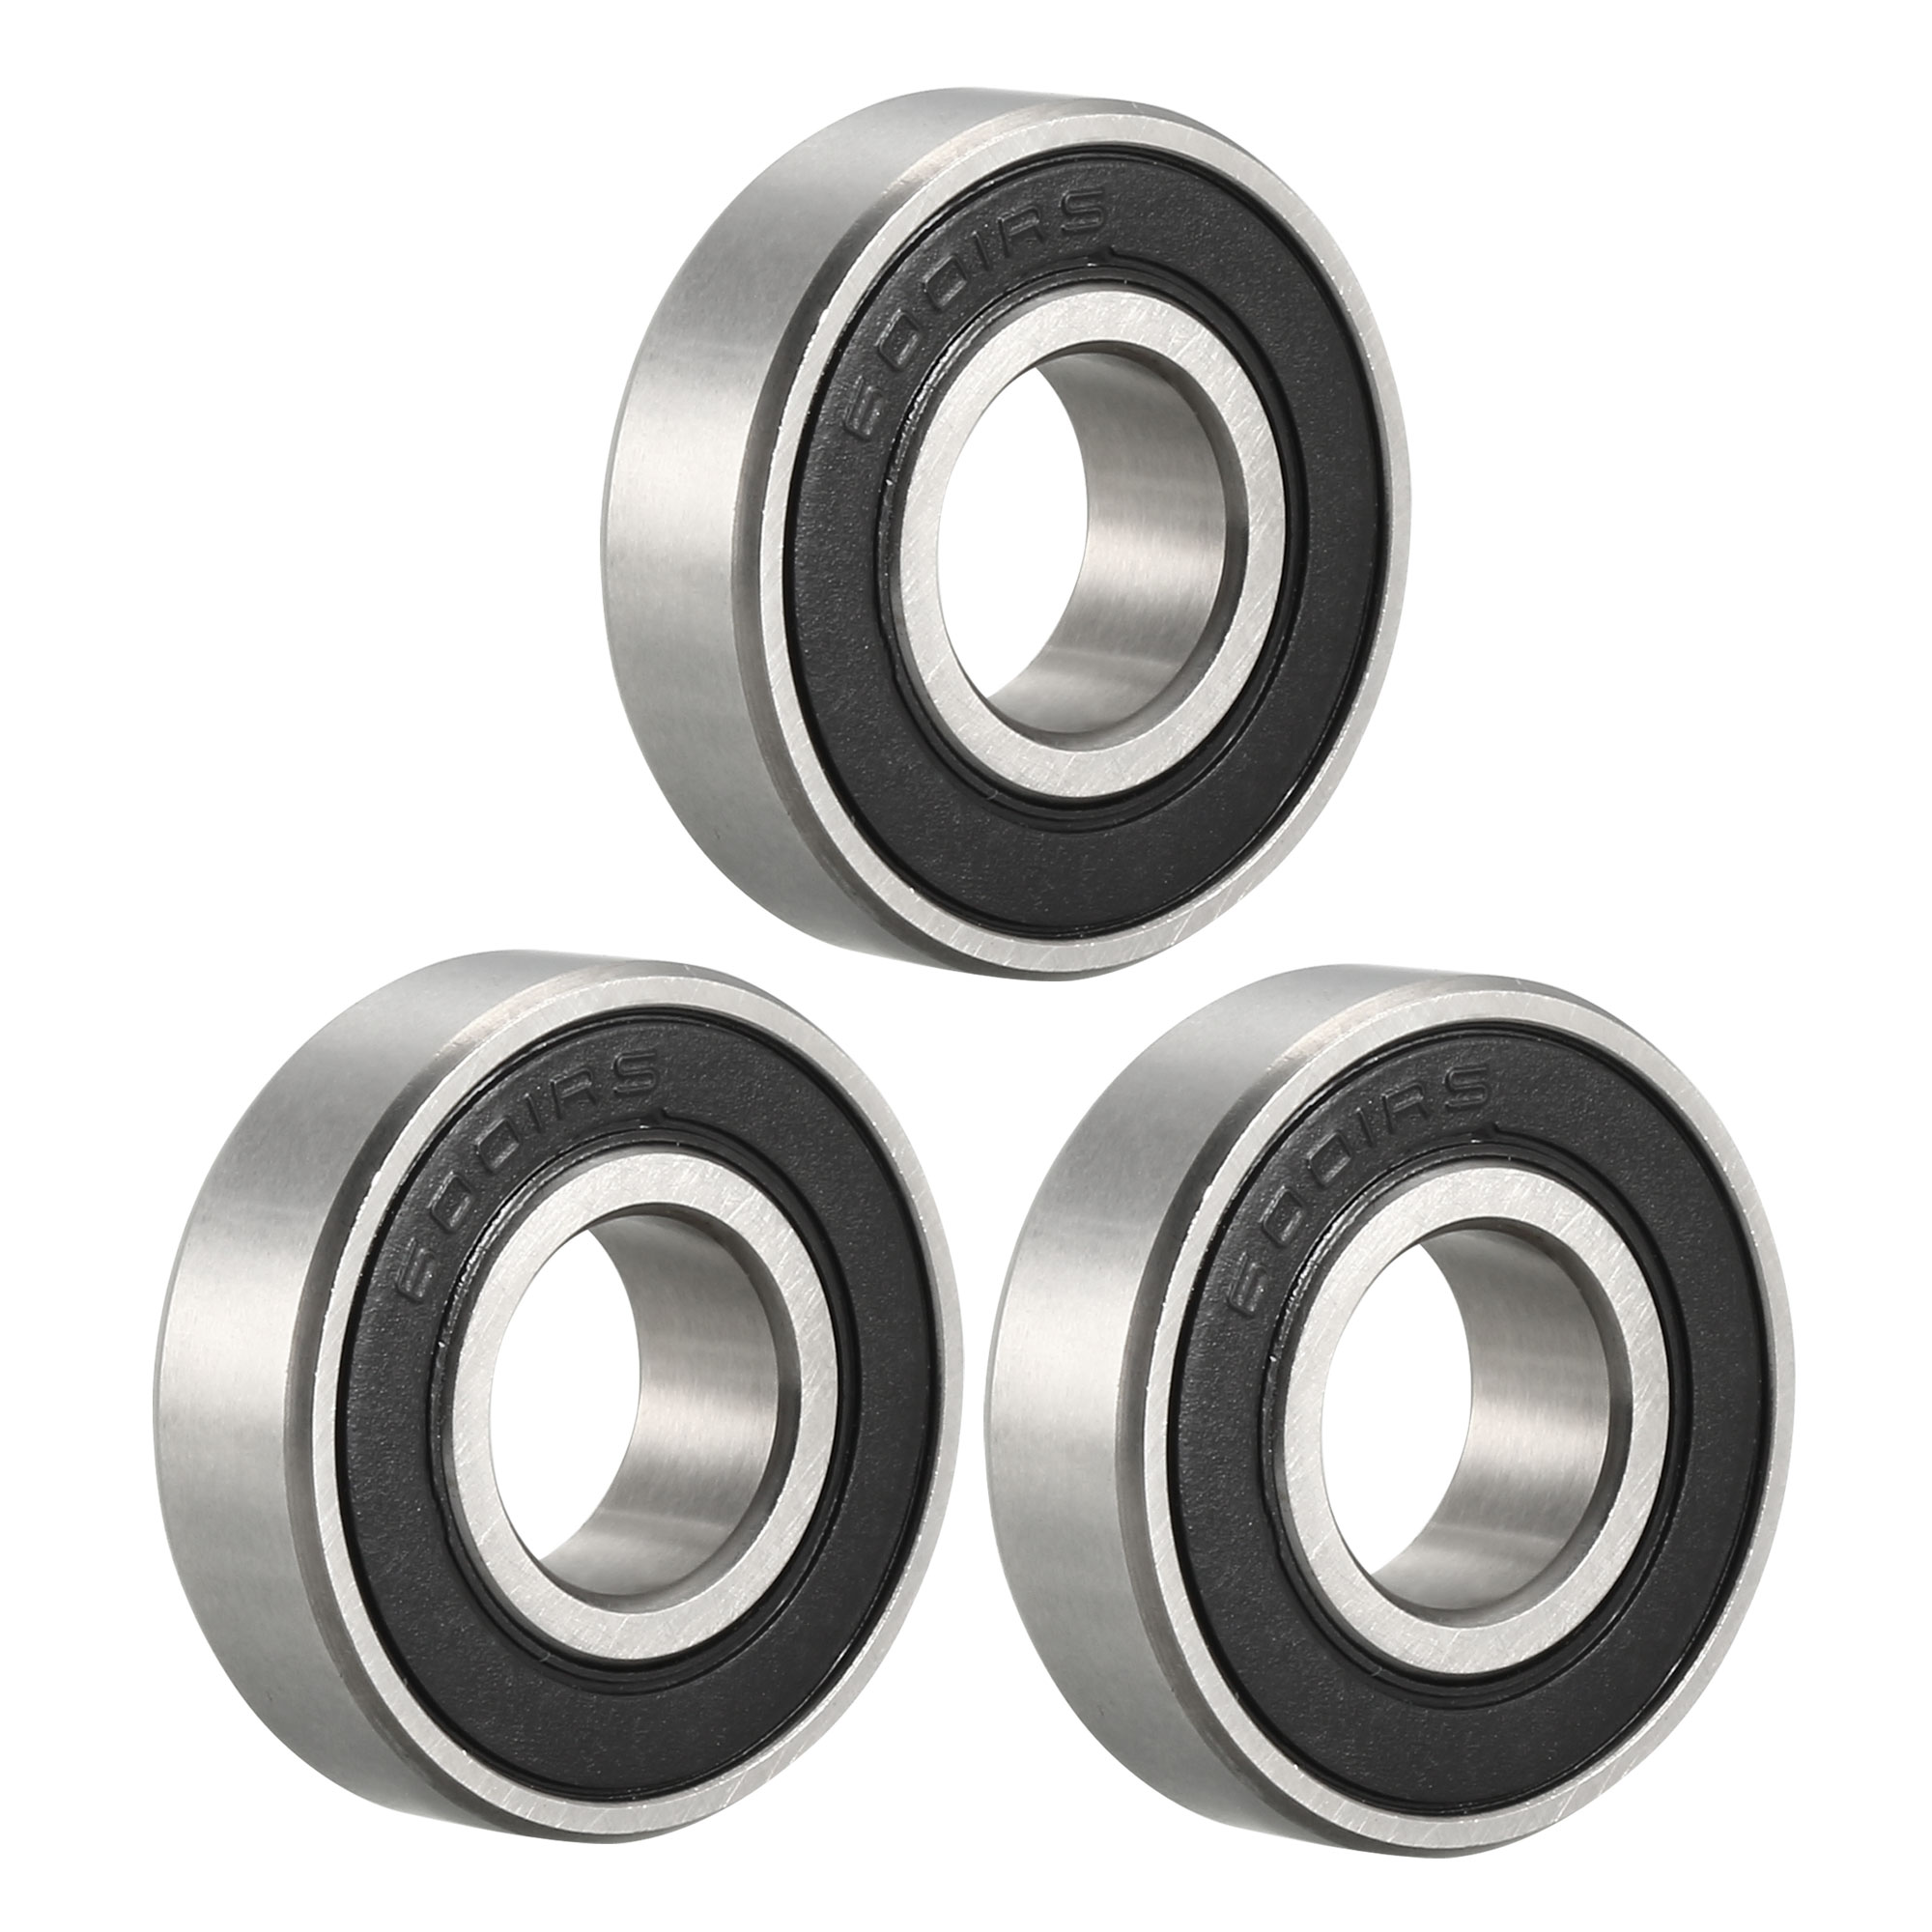 6001-2RS Metal Rubber Ball Bearing Bearings BLACK 6001RS 20 PCS 12x28x8 mm